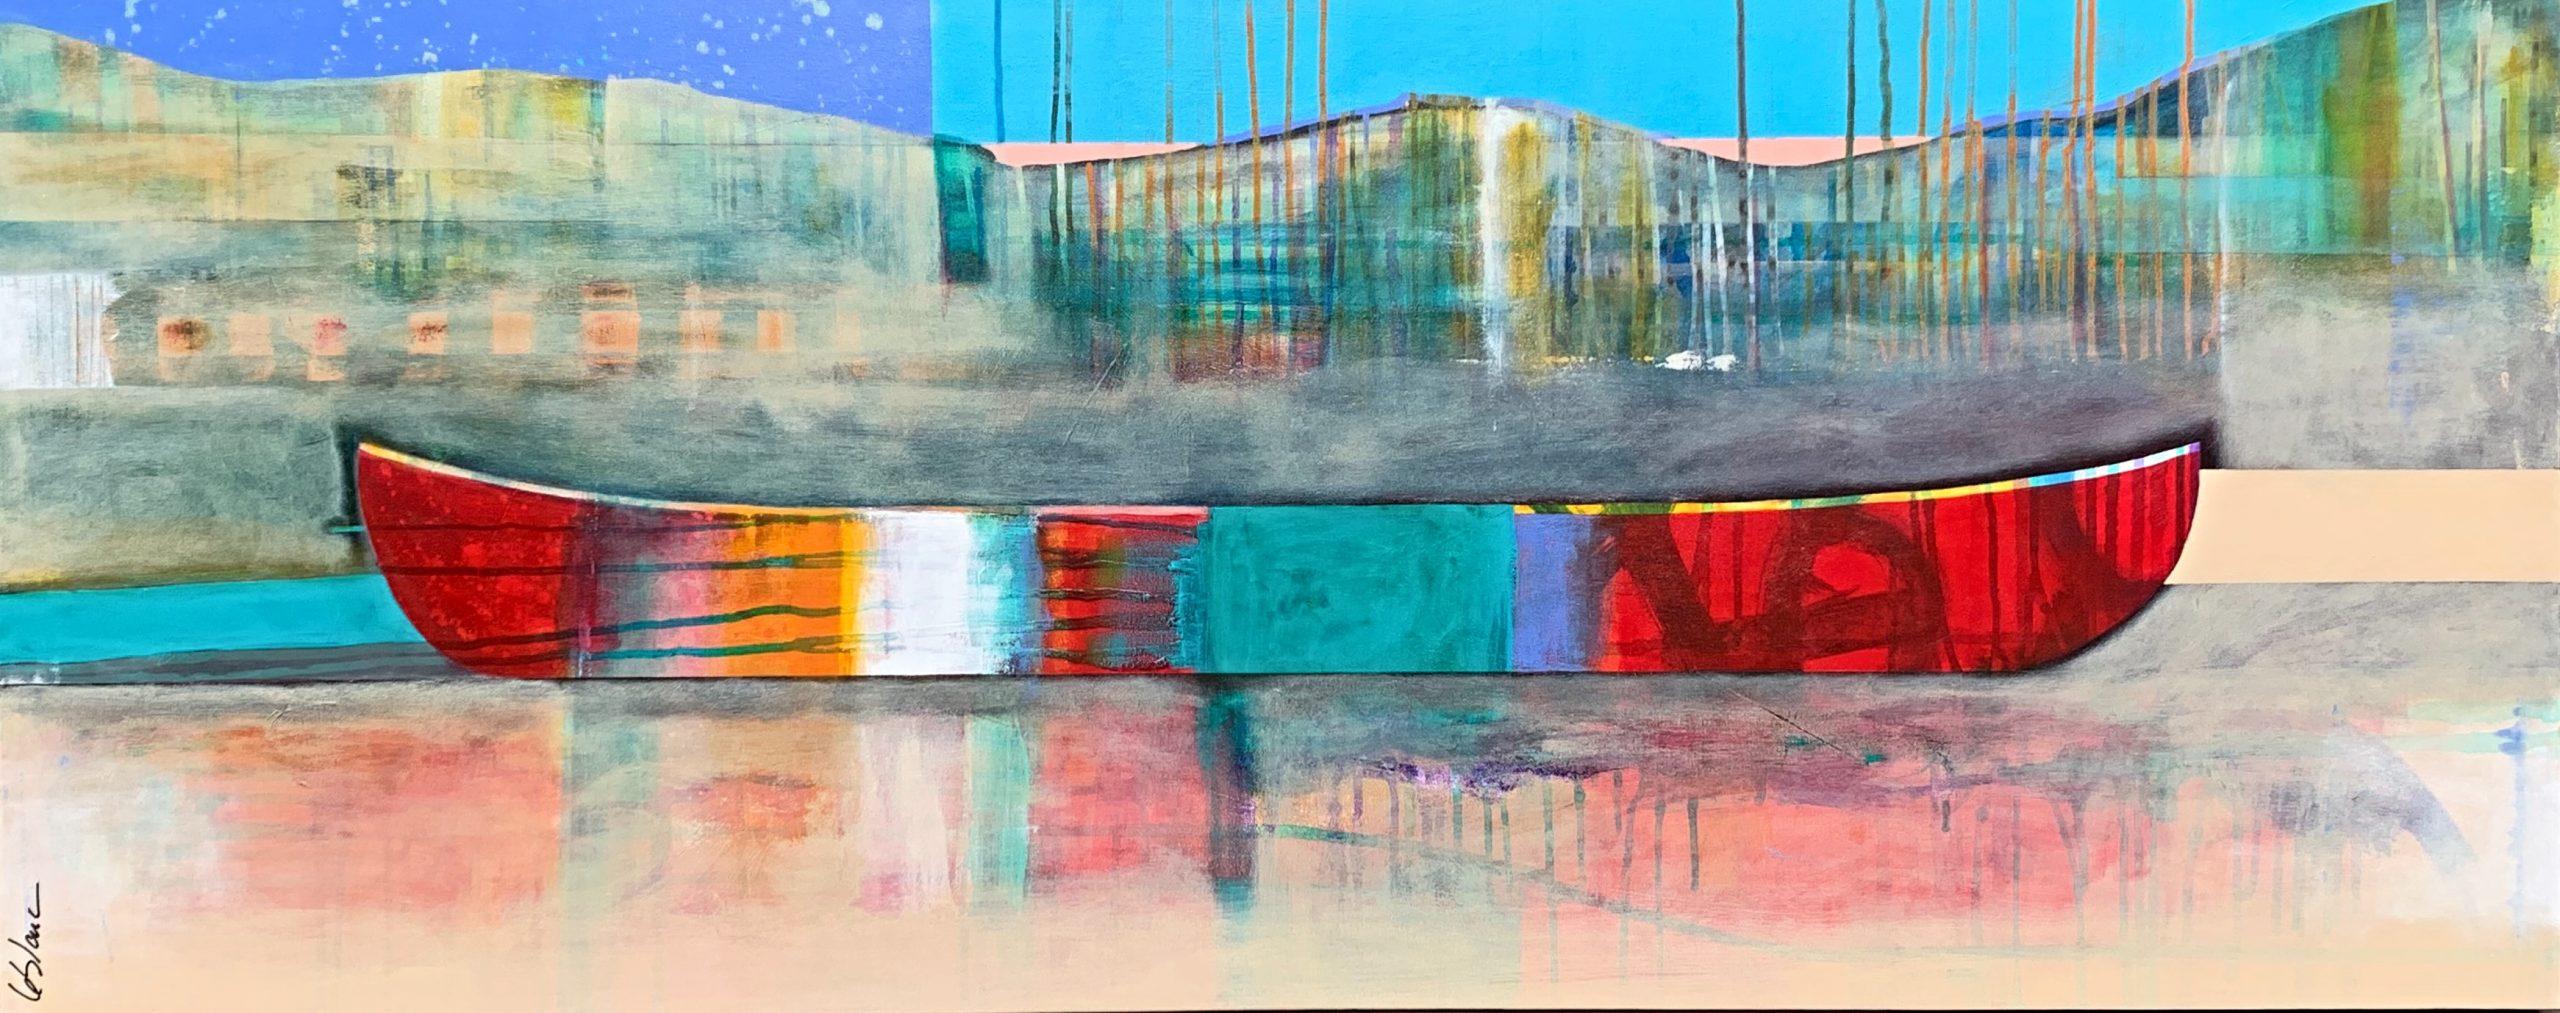 Tu m'amènes vers d'autres rives, mixed media canoe painting by Sylvain Leblanc | Effusion Art Gallery + Cast Glass Studio, Invermere BC